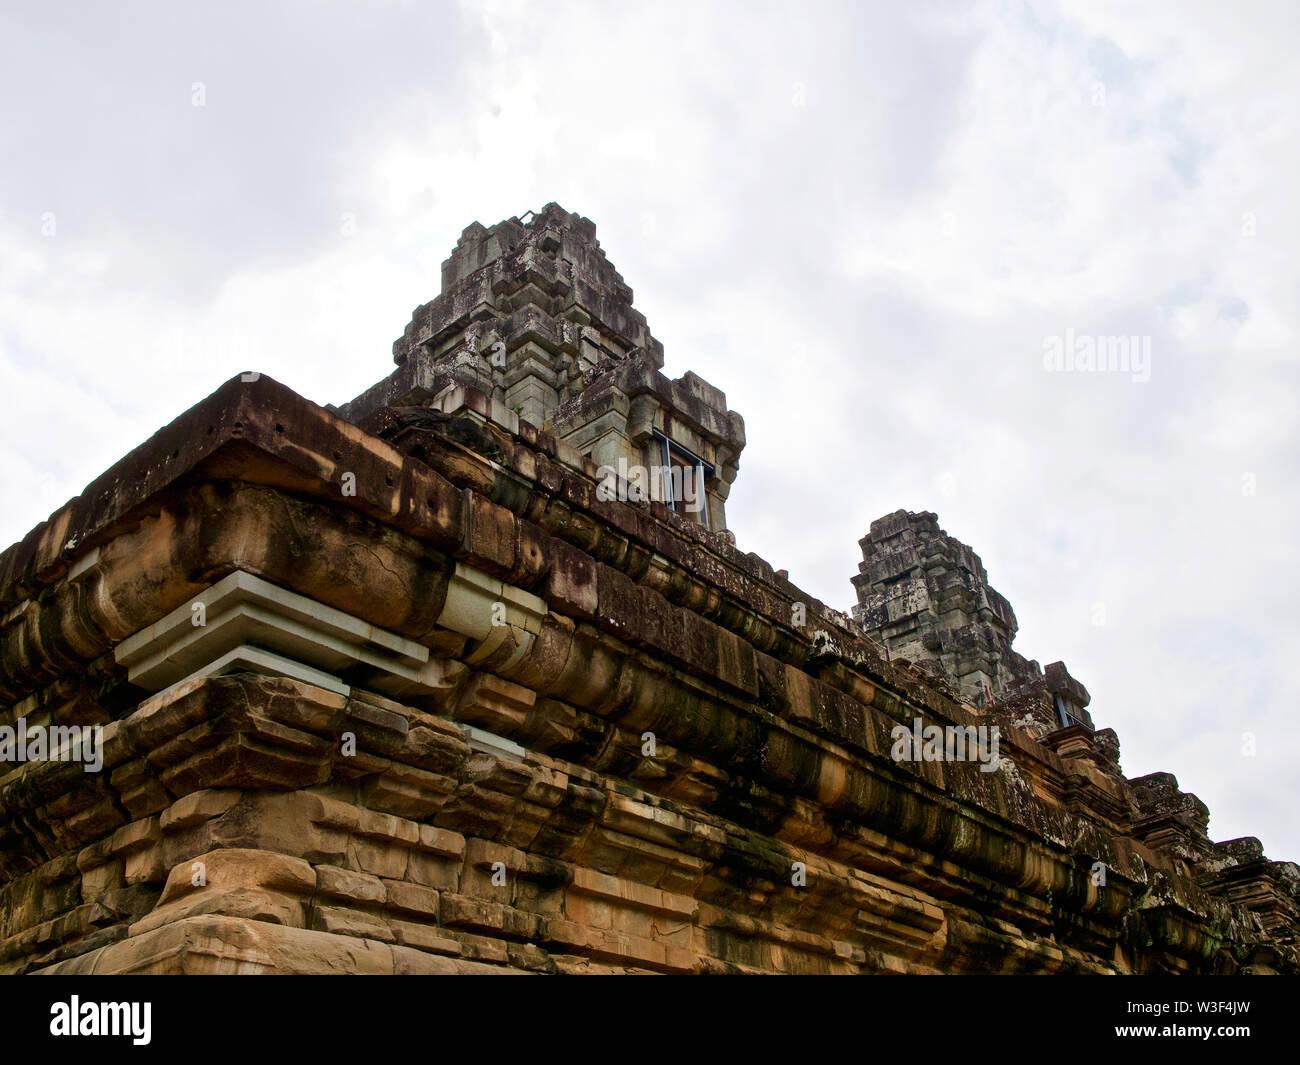 Architektur der alten Tempelanlage Angkor, Siem Reap, Kambodscha Stockbild